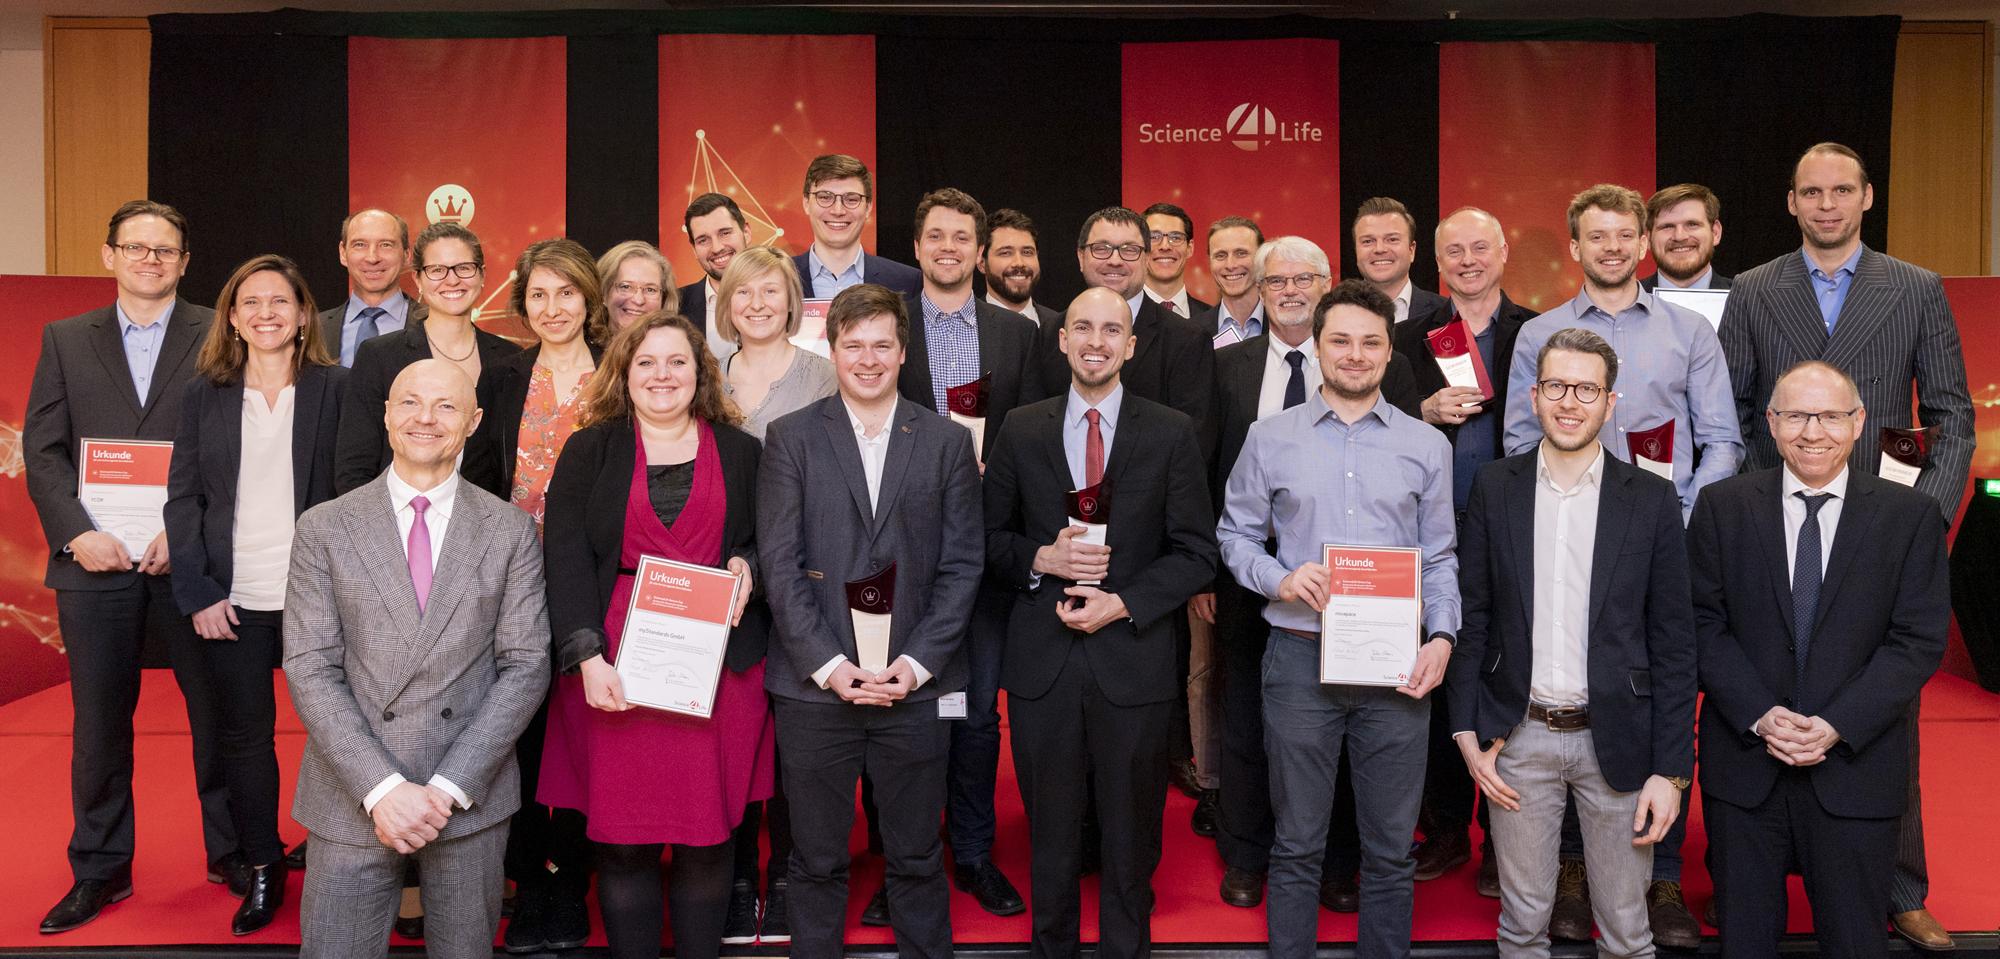 Science4Life Venture Cup, Science4Life Energy Award, Konzeptprämierung, Hessische Landesvertretung, Gewinnerteams Science4Life Konzeptphase